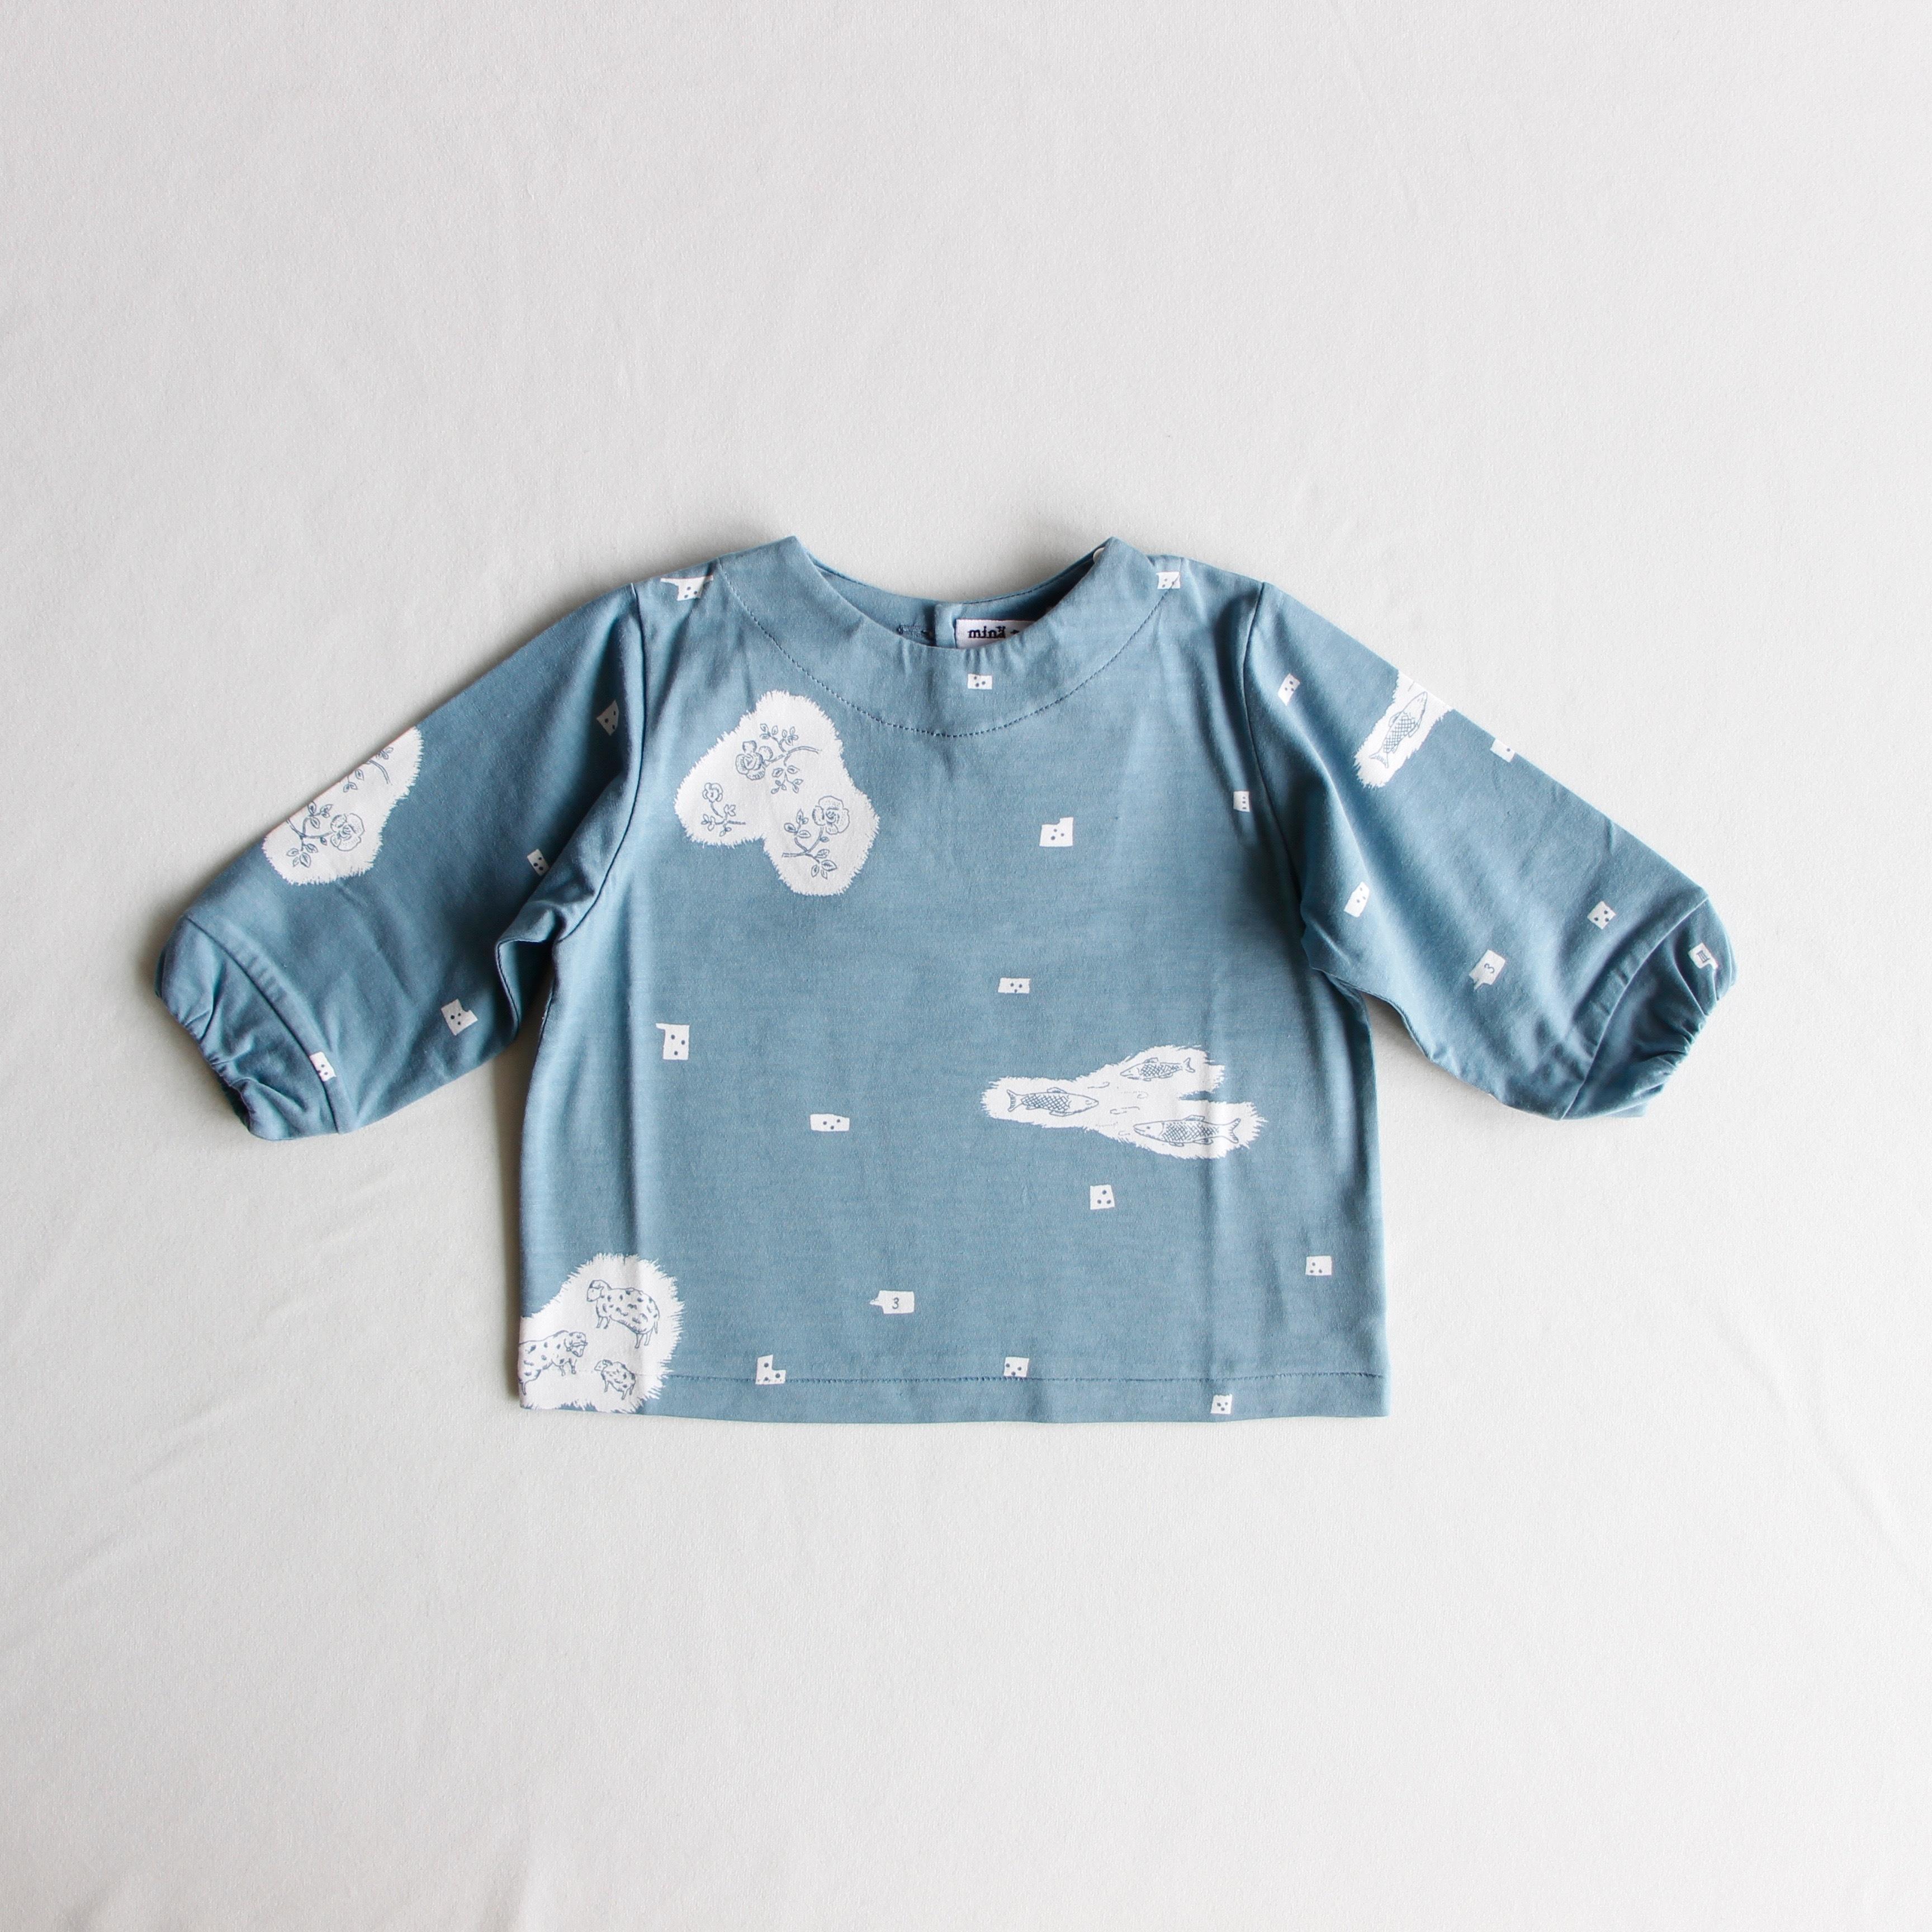 《mina perhonen 2019AW》trois 長袖カットソー / blue / 80-100cm